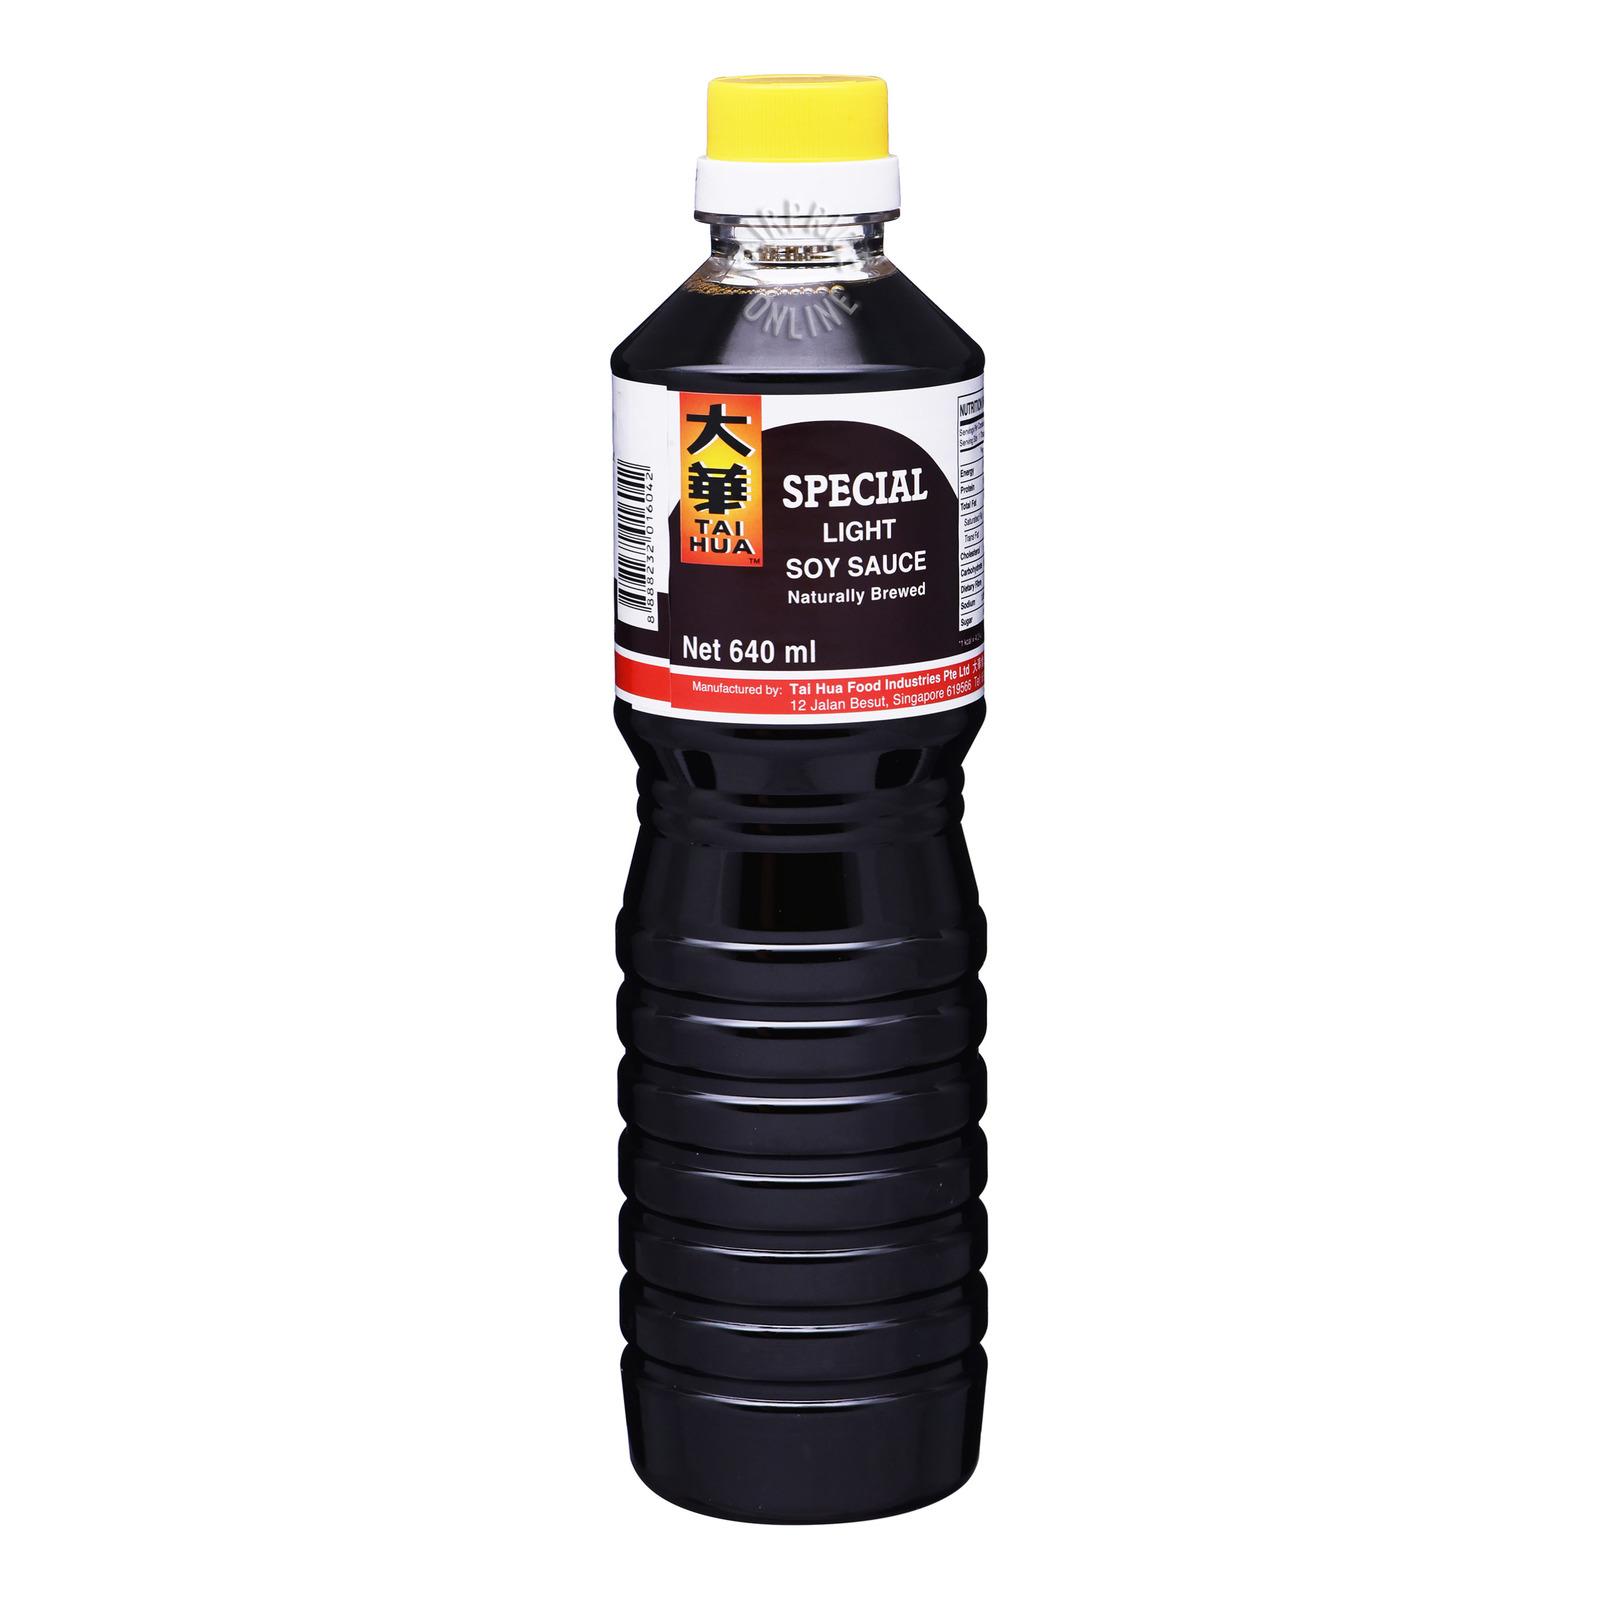 Tai Hua Light Soy Sauce - Special